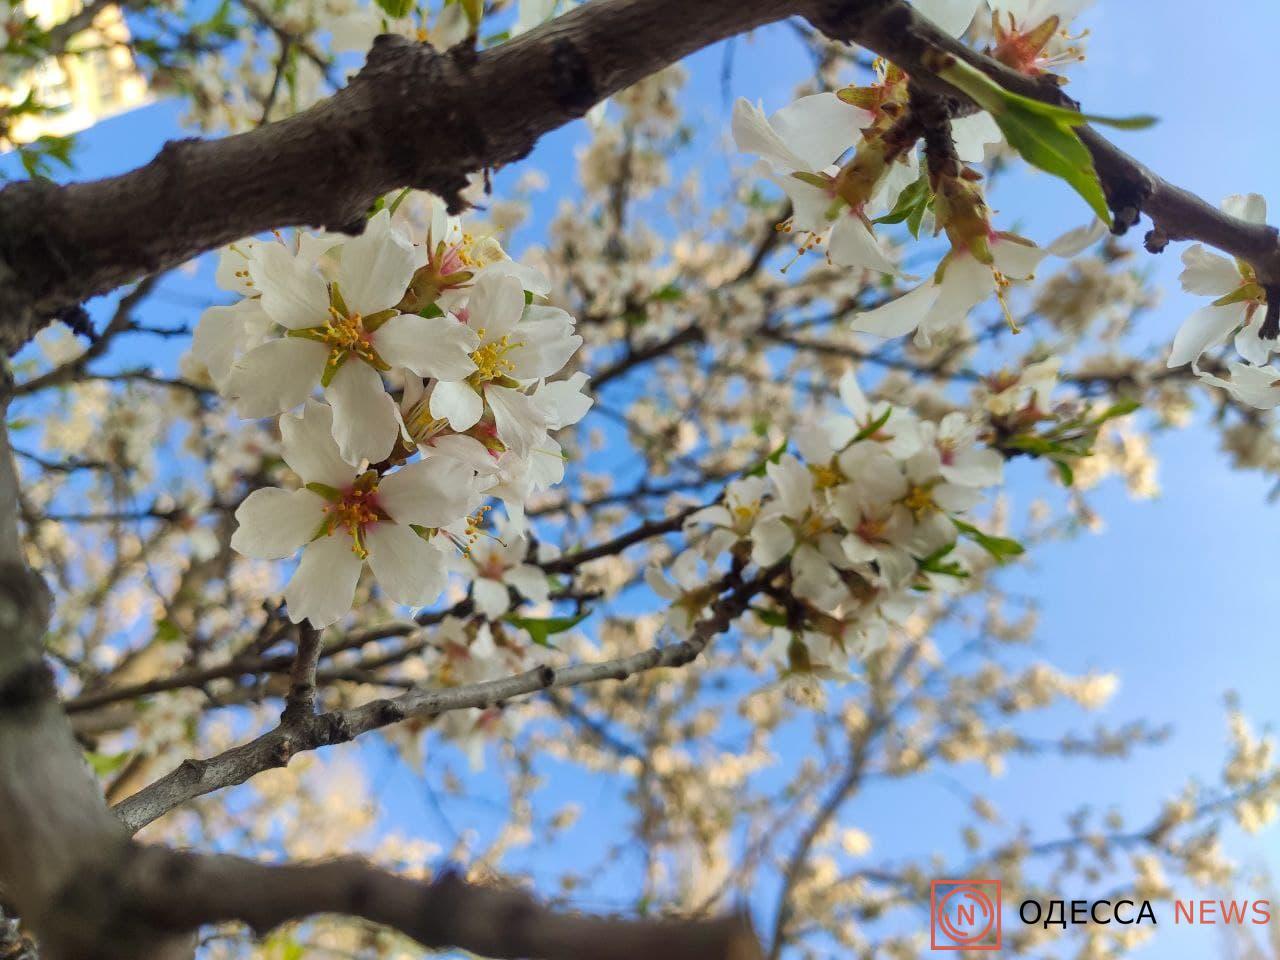 photo_2021-04-21_18-06-39.jpg